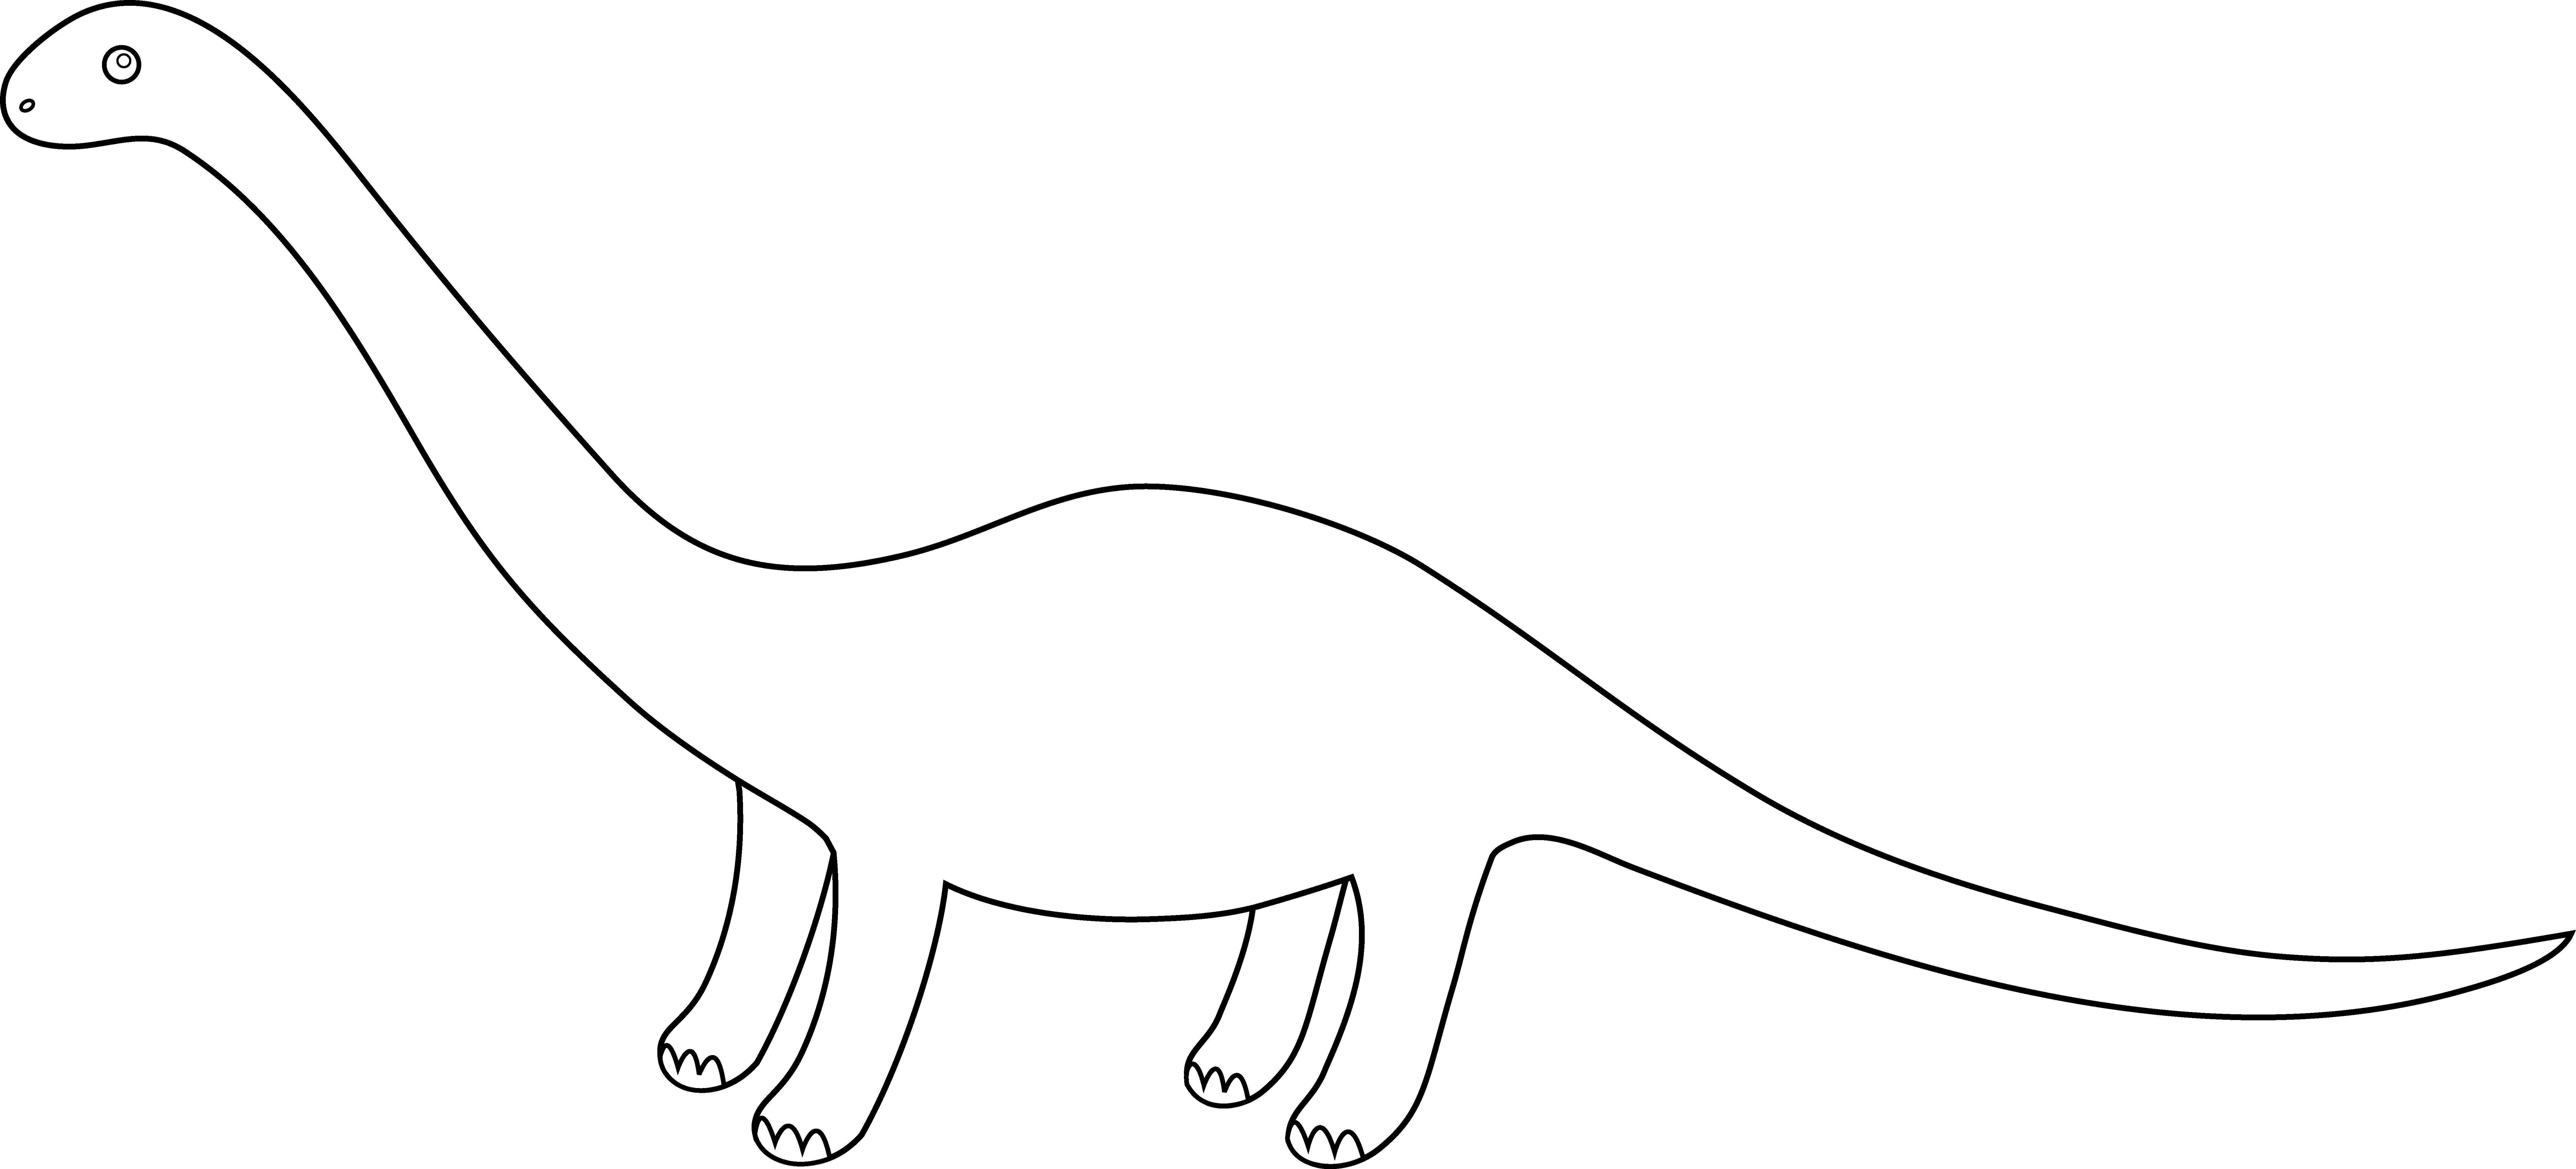 Dinosaur clipart outline. Panda free images dinosaurclipartblackandwhite